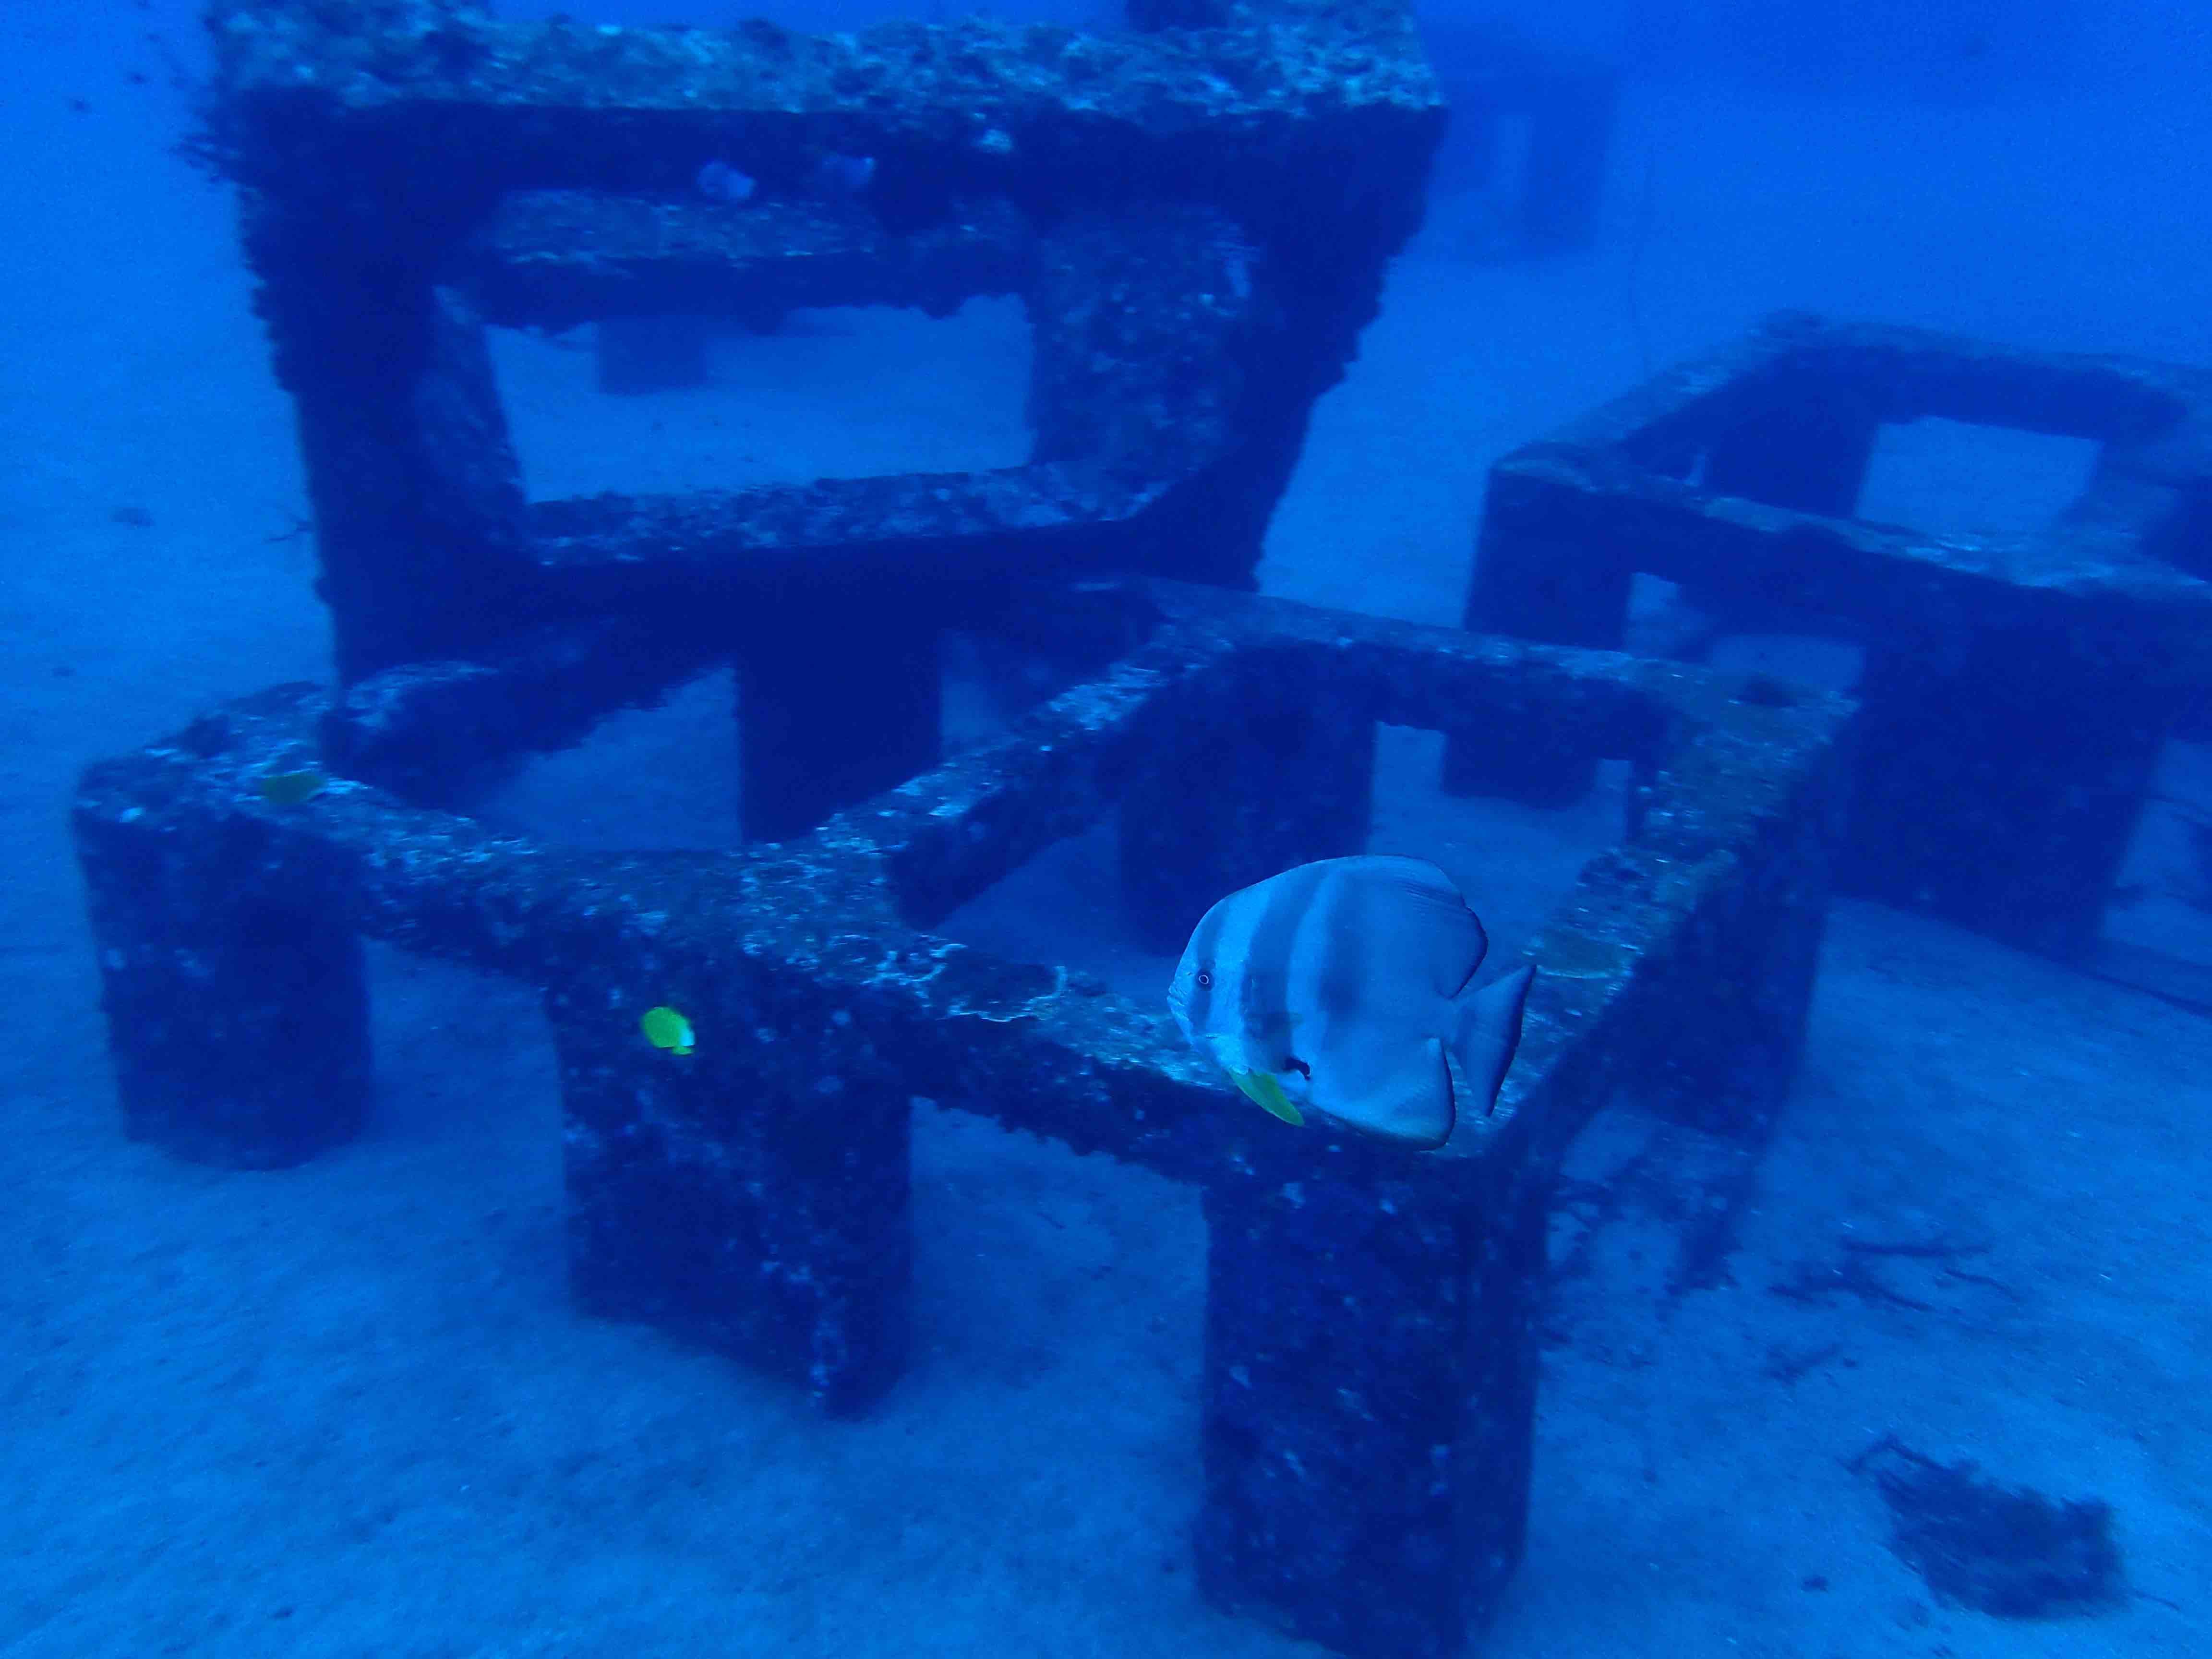 http://www.aquamarine-dive.net/blog/index.html/2015/10/09/0926.jpg